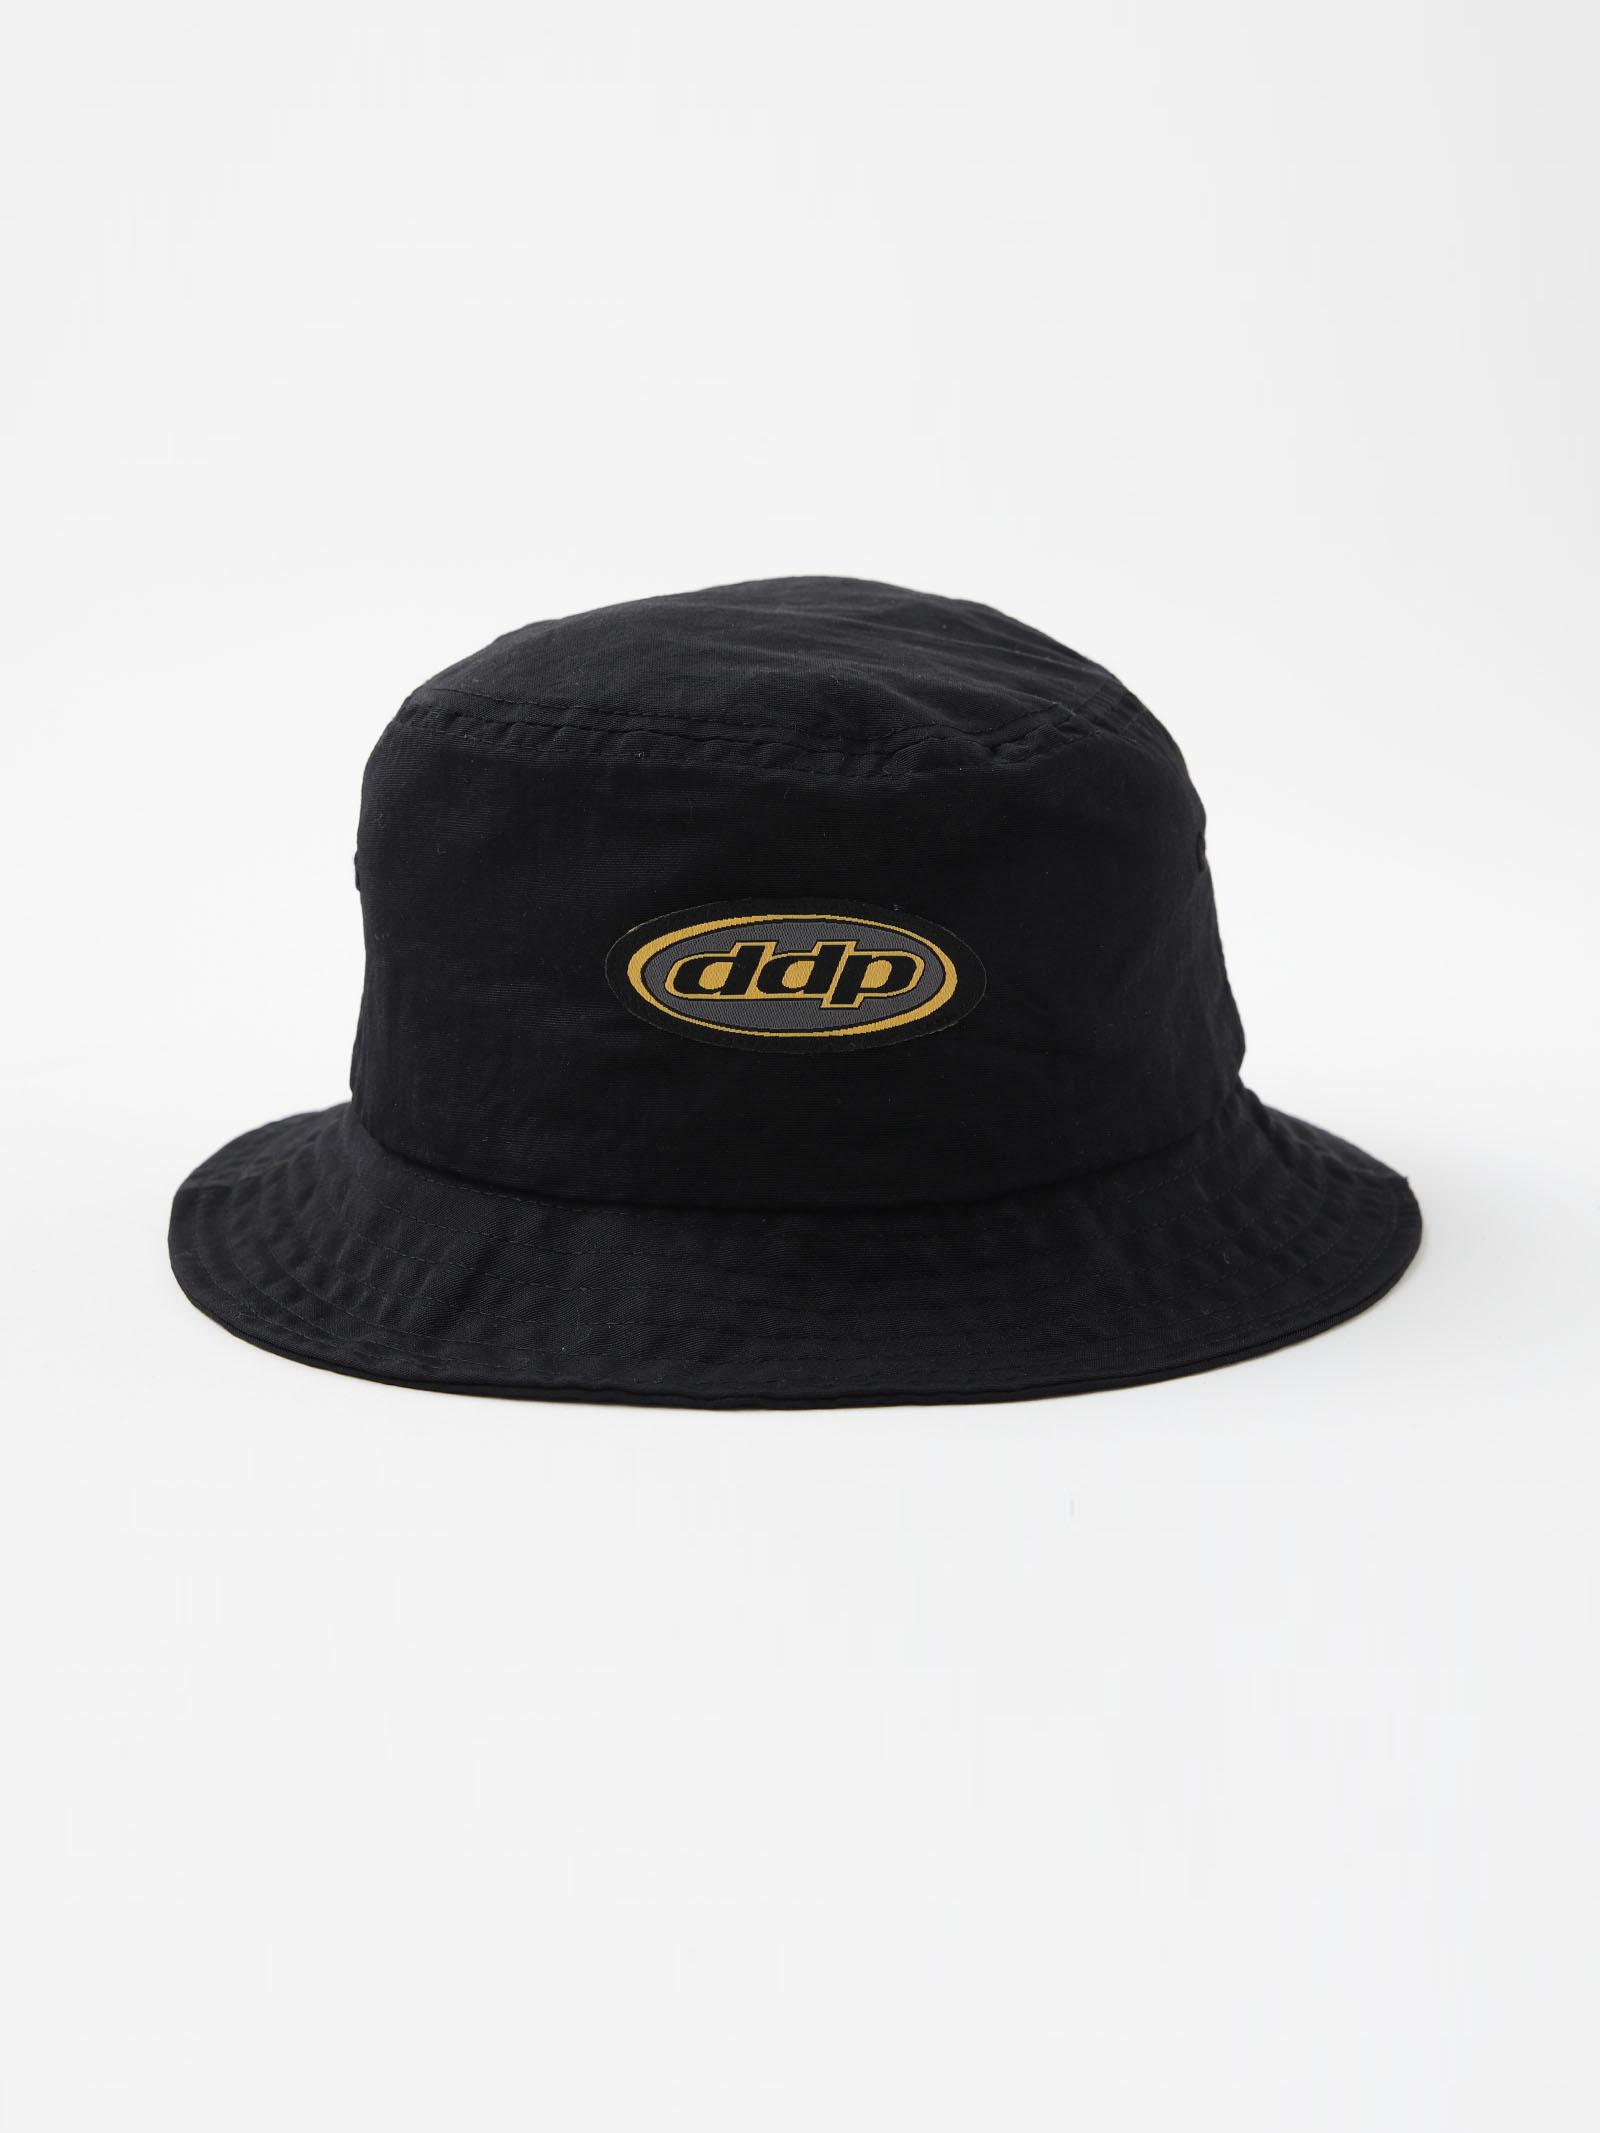 "ddp ARCHIVE LOGO BUCKET HAT ""Blanc""のサムネイル1"